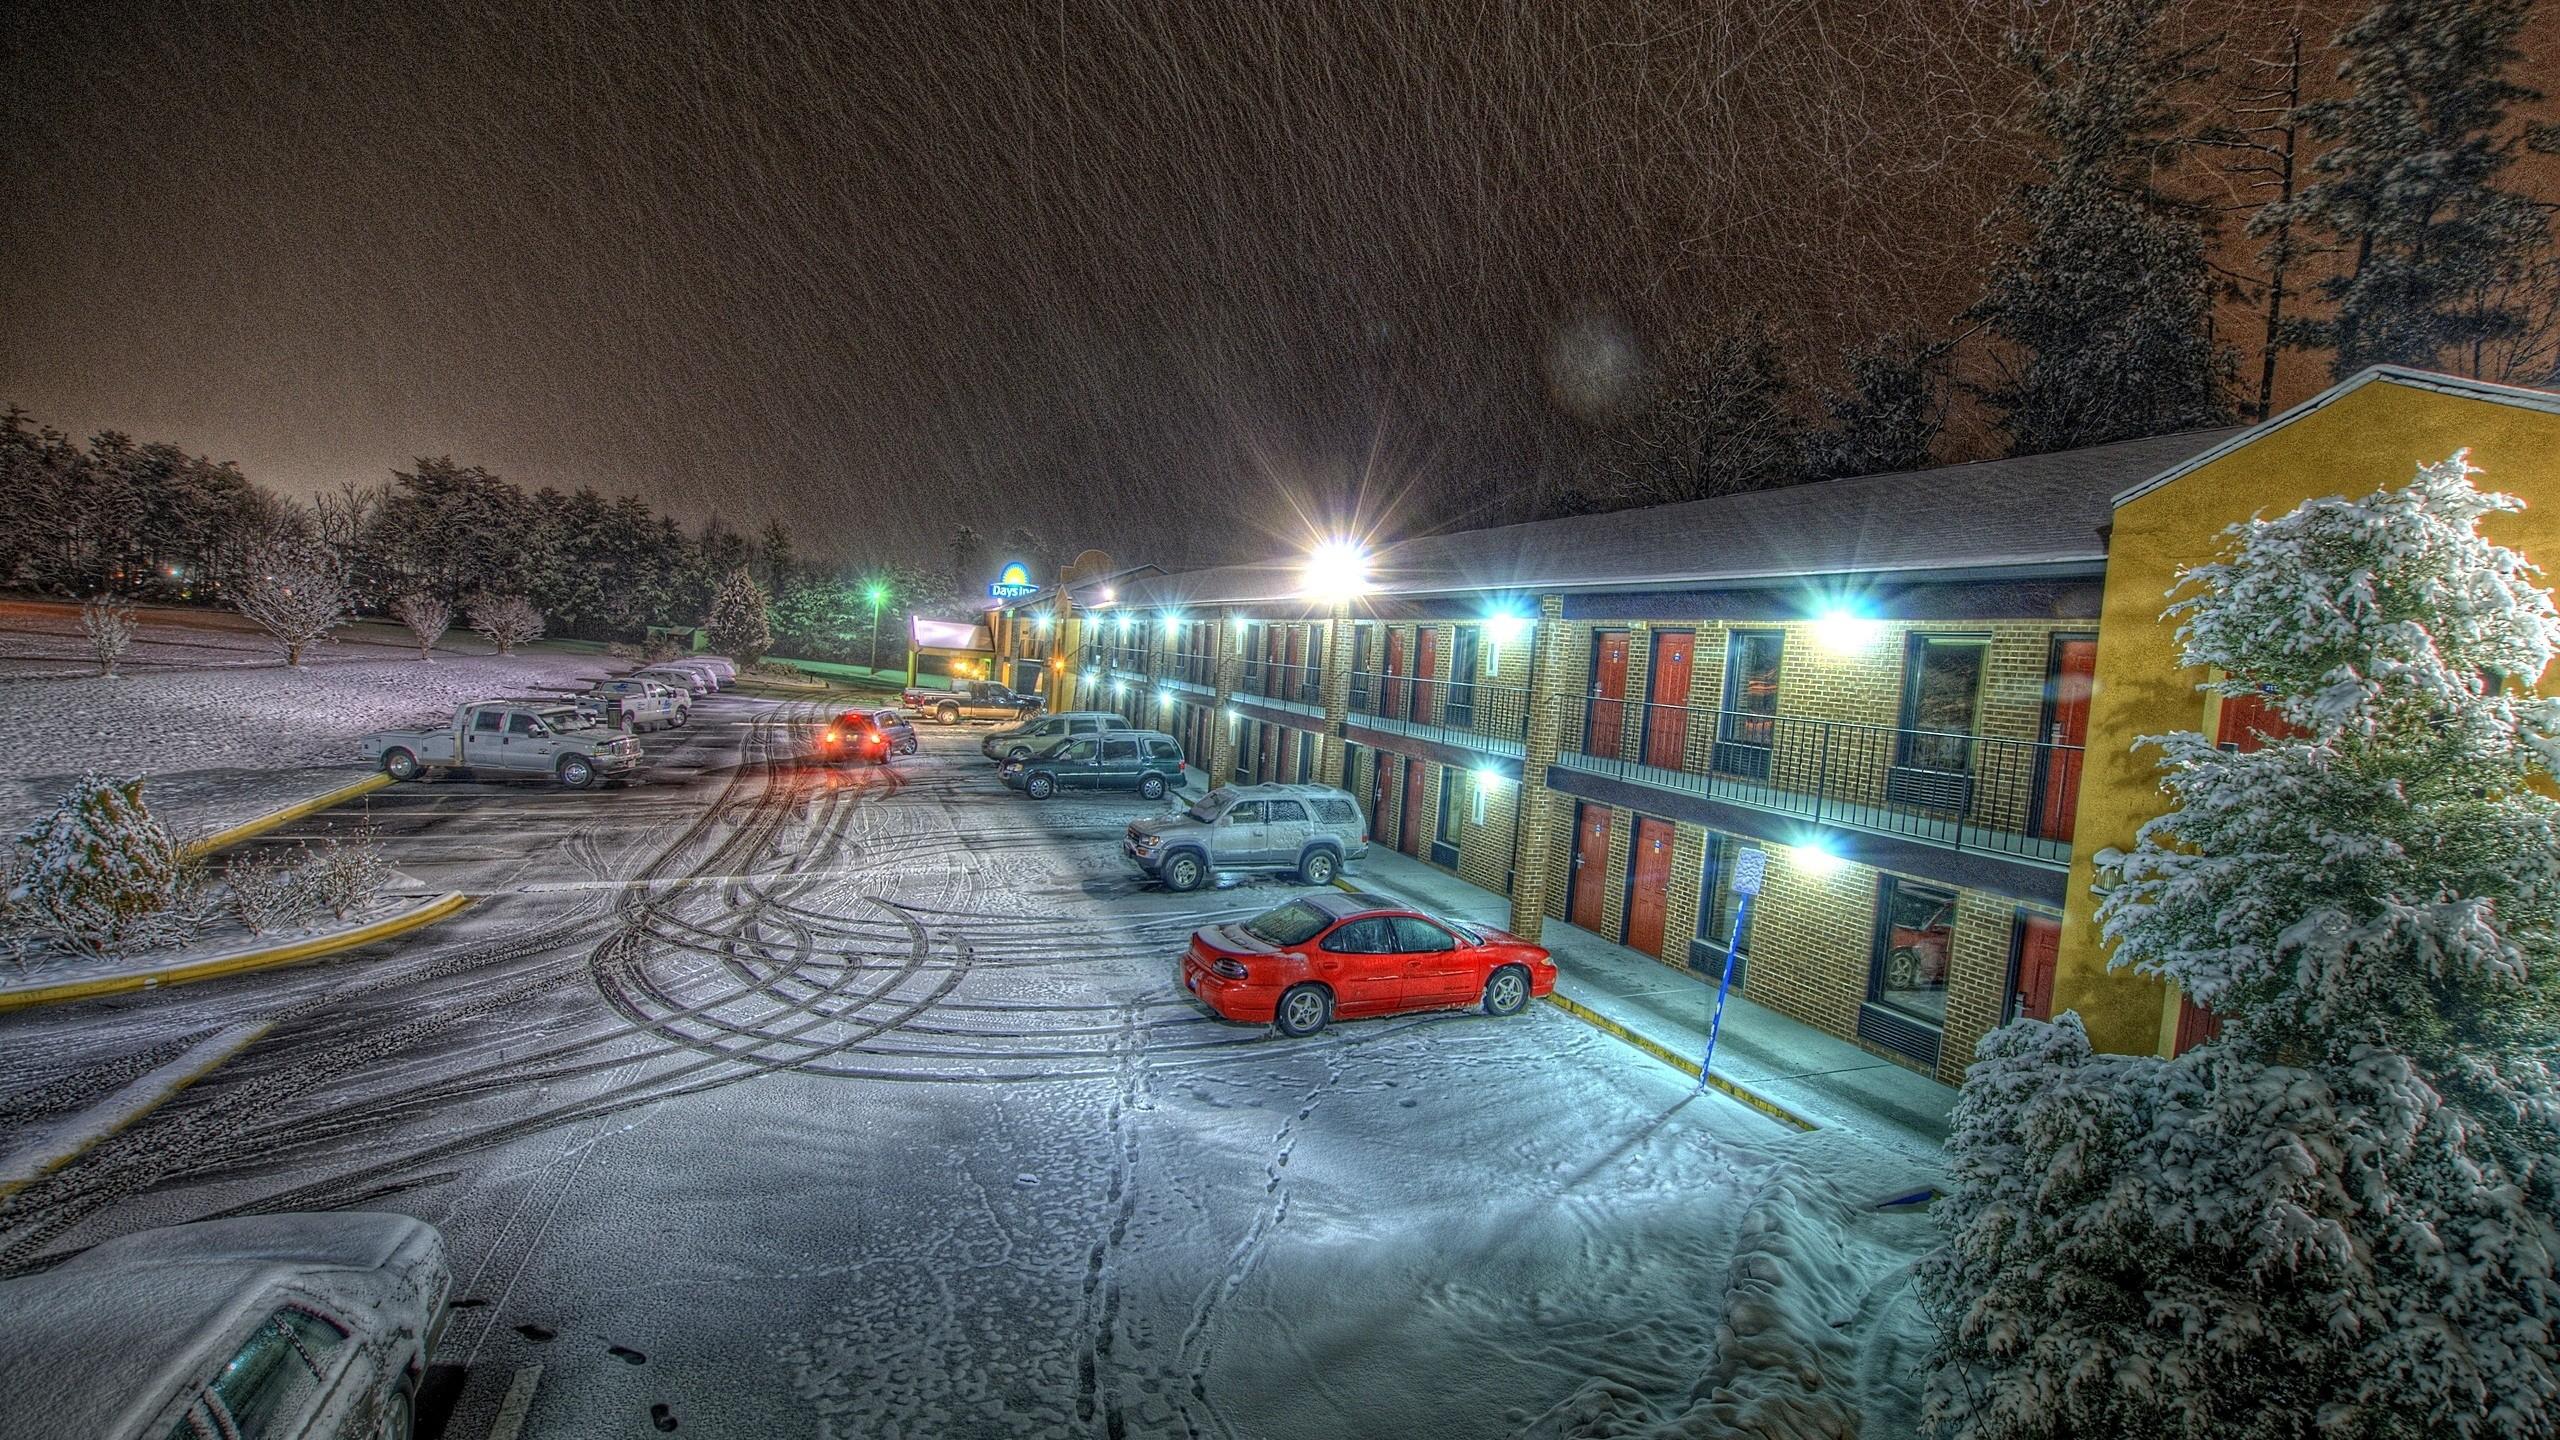 2560x1440 Px Car Exposure Hotel Light Long Night Snow Storm